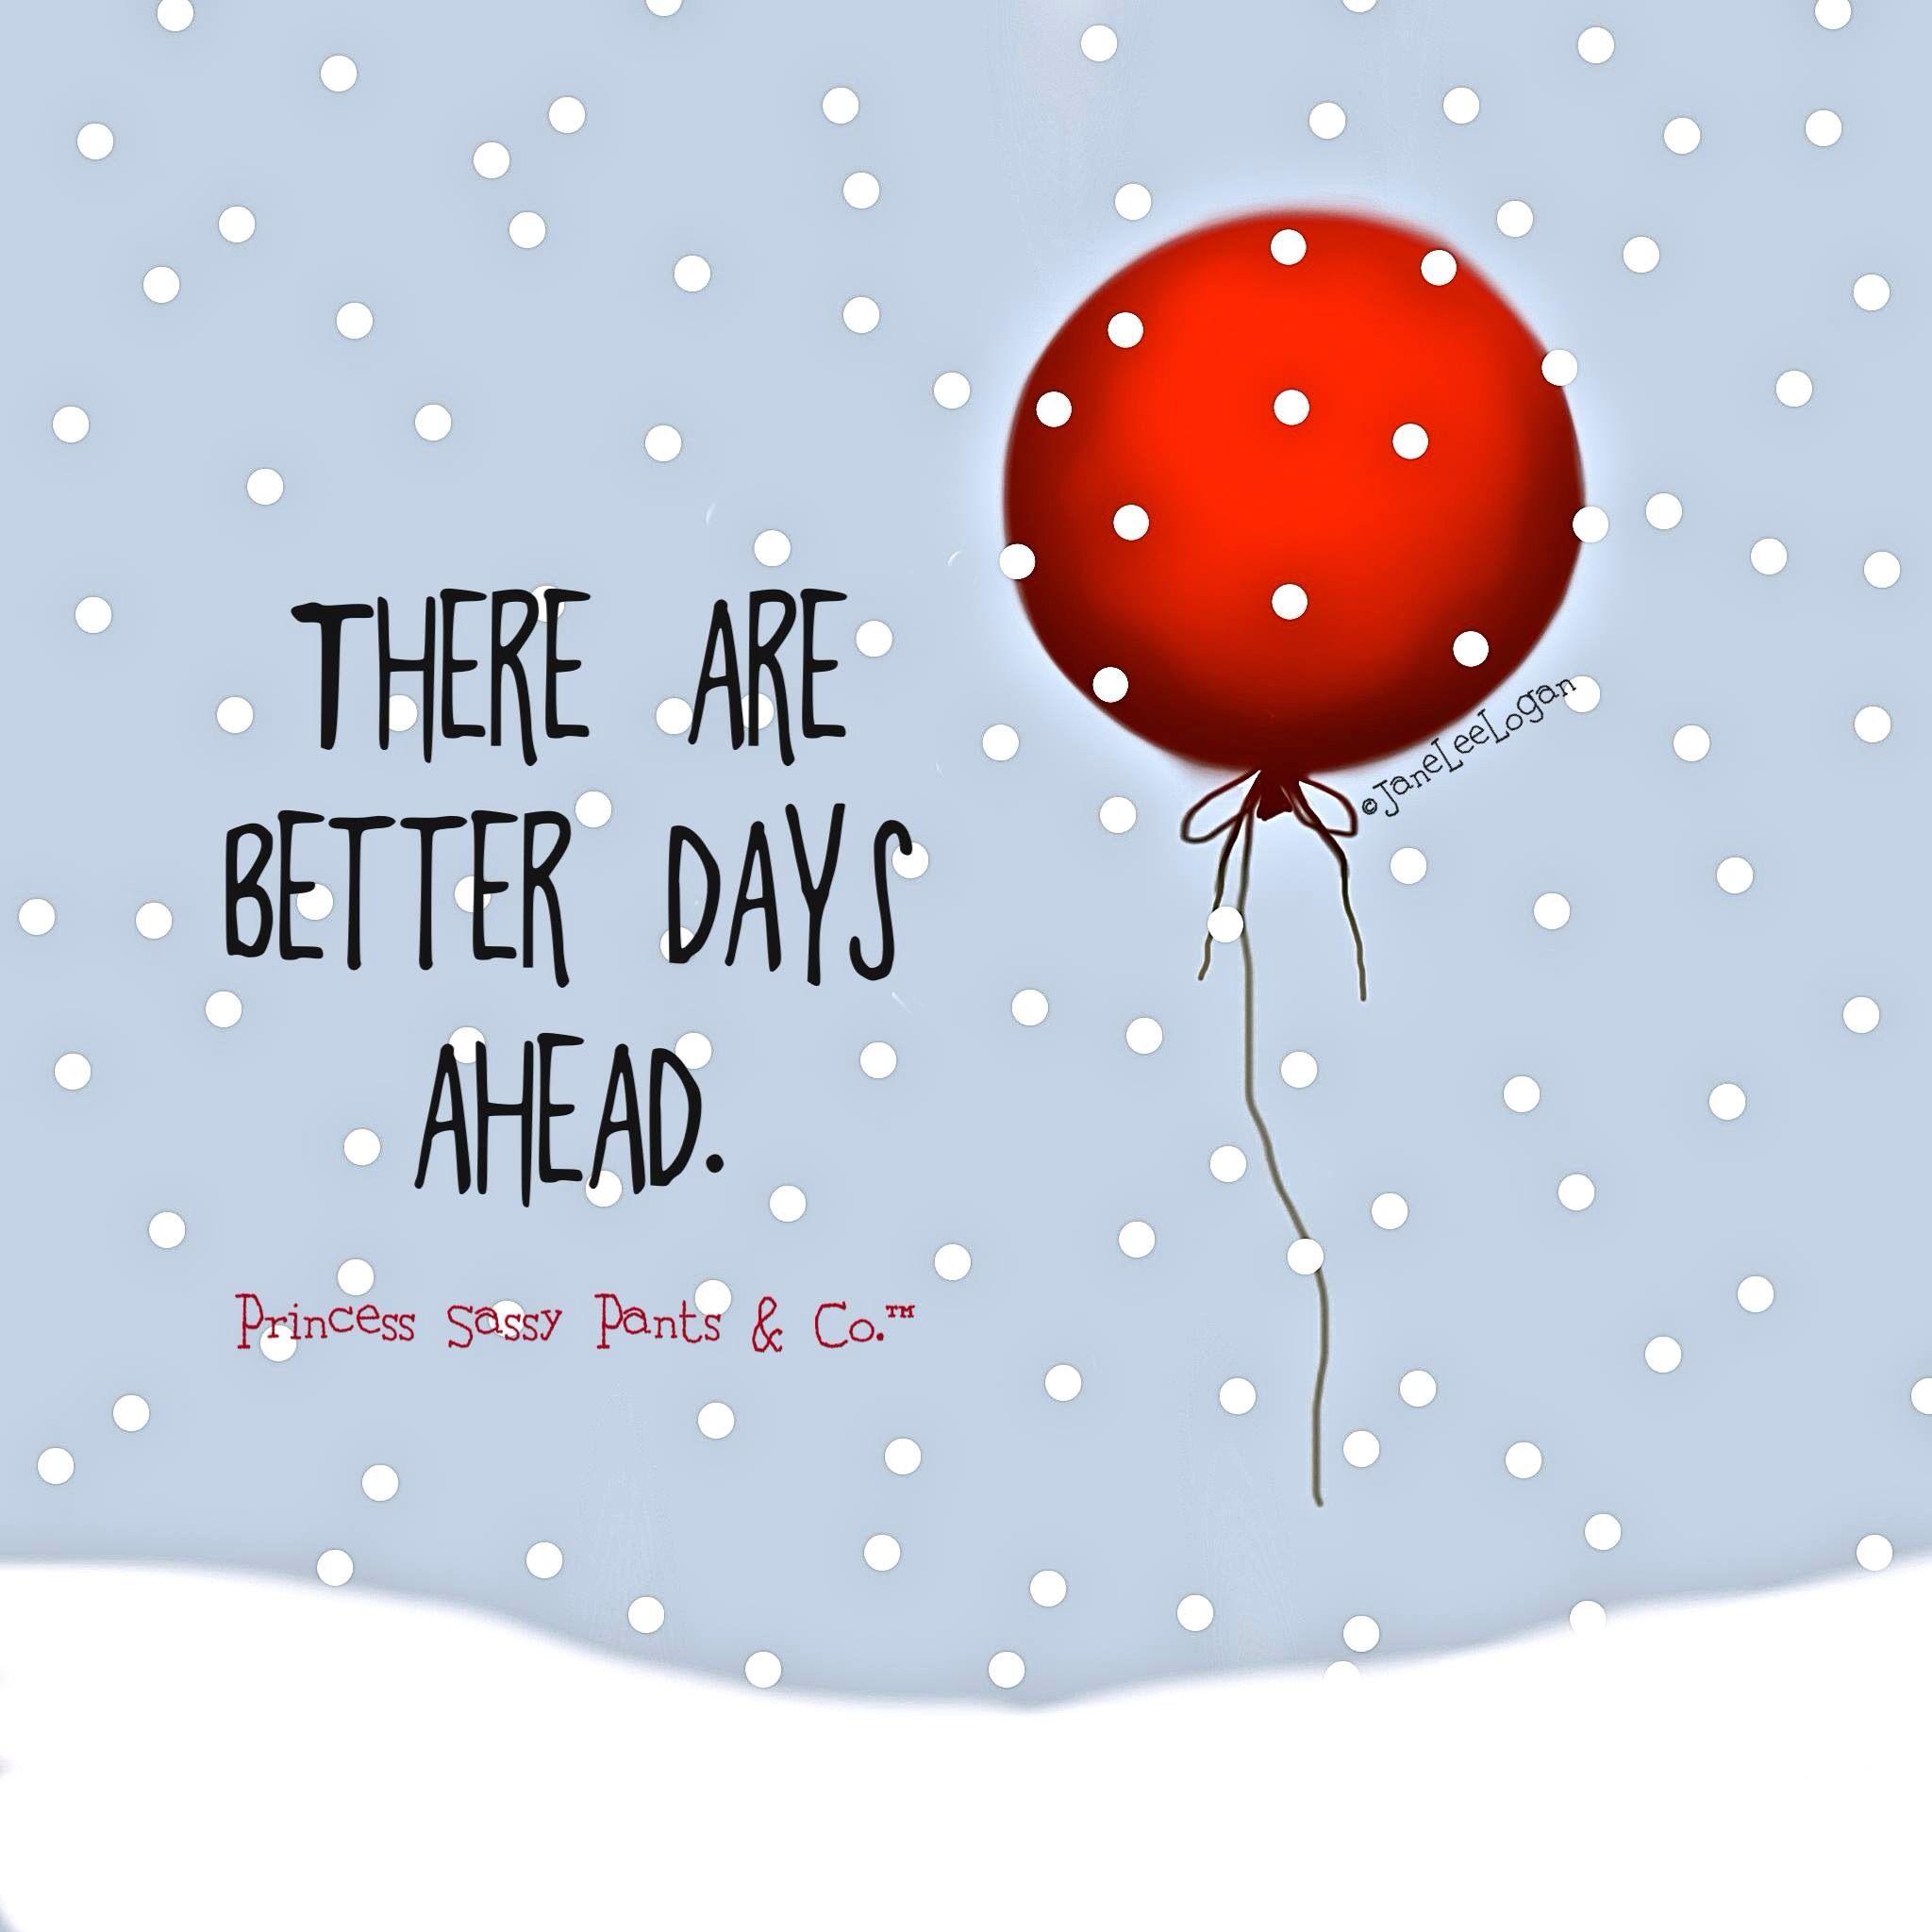 Better Days Ahead Sassy Pants Sassy Pants Quotes Sassy